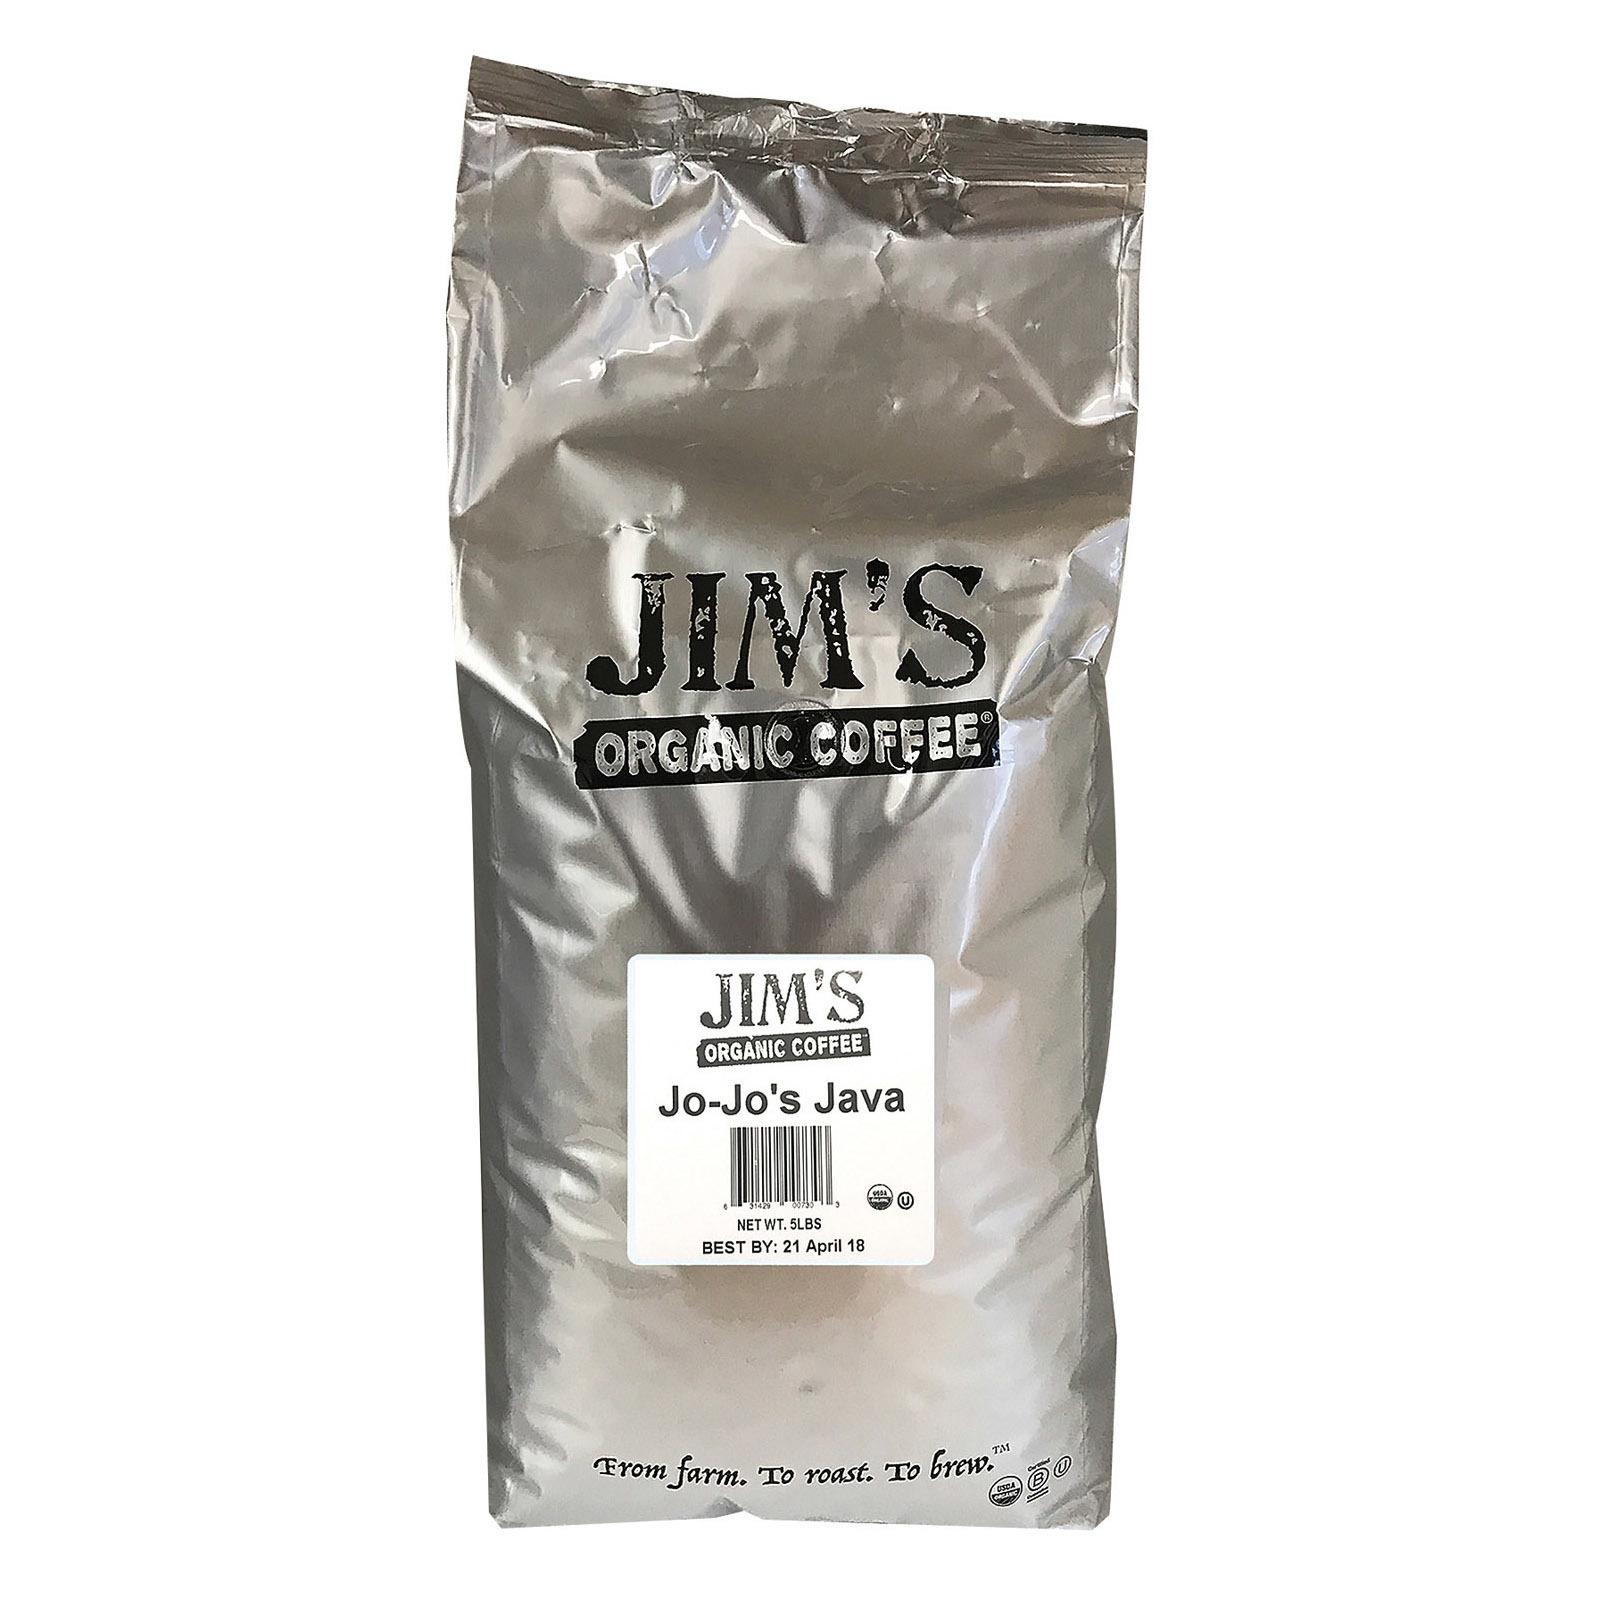 Jim's Organic Coffee - Whole Bean - Jo-Jo's Java - Bulk - 5 lb.